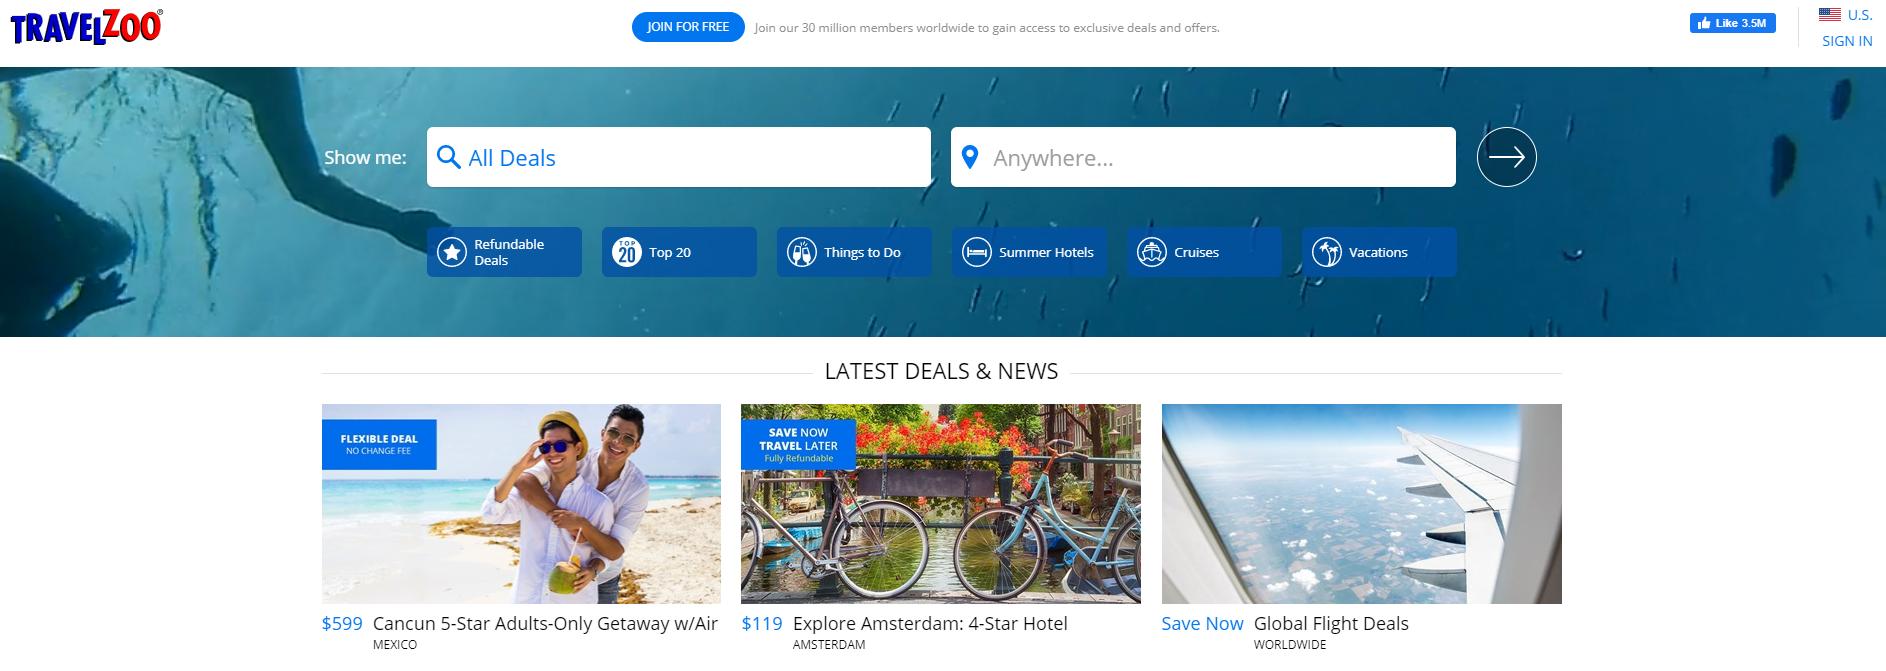 Travelzoo sajt